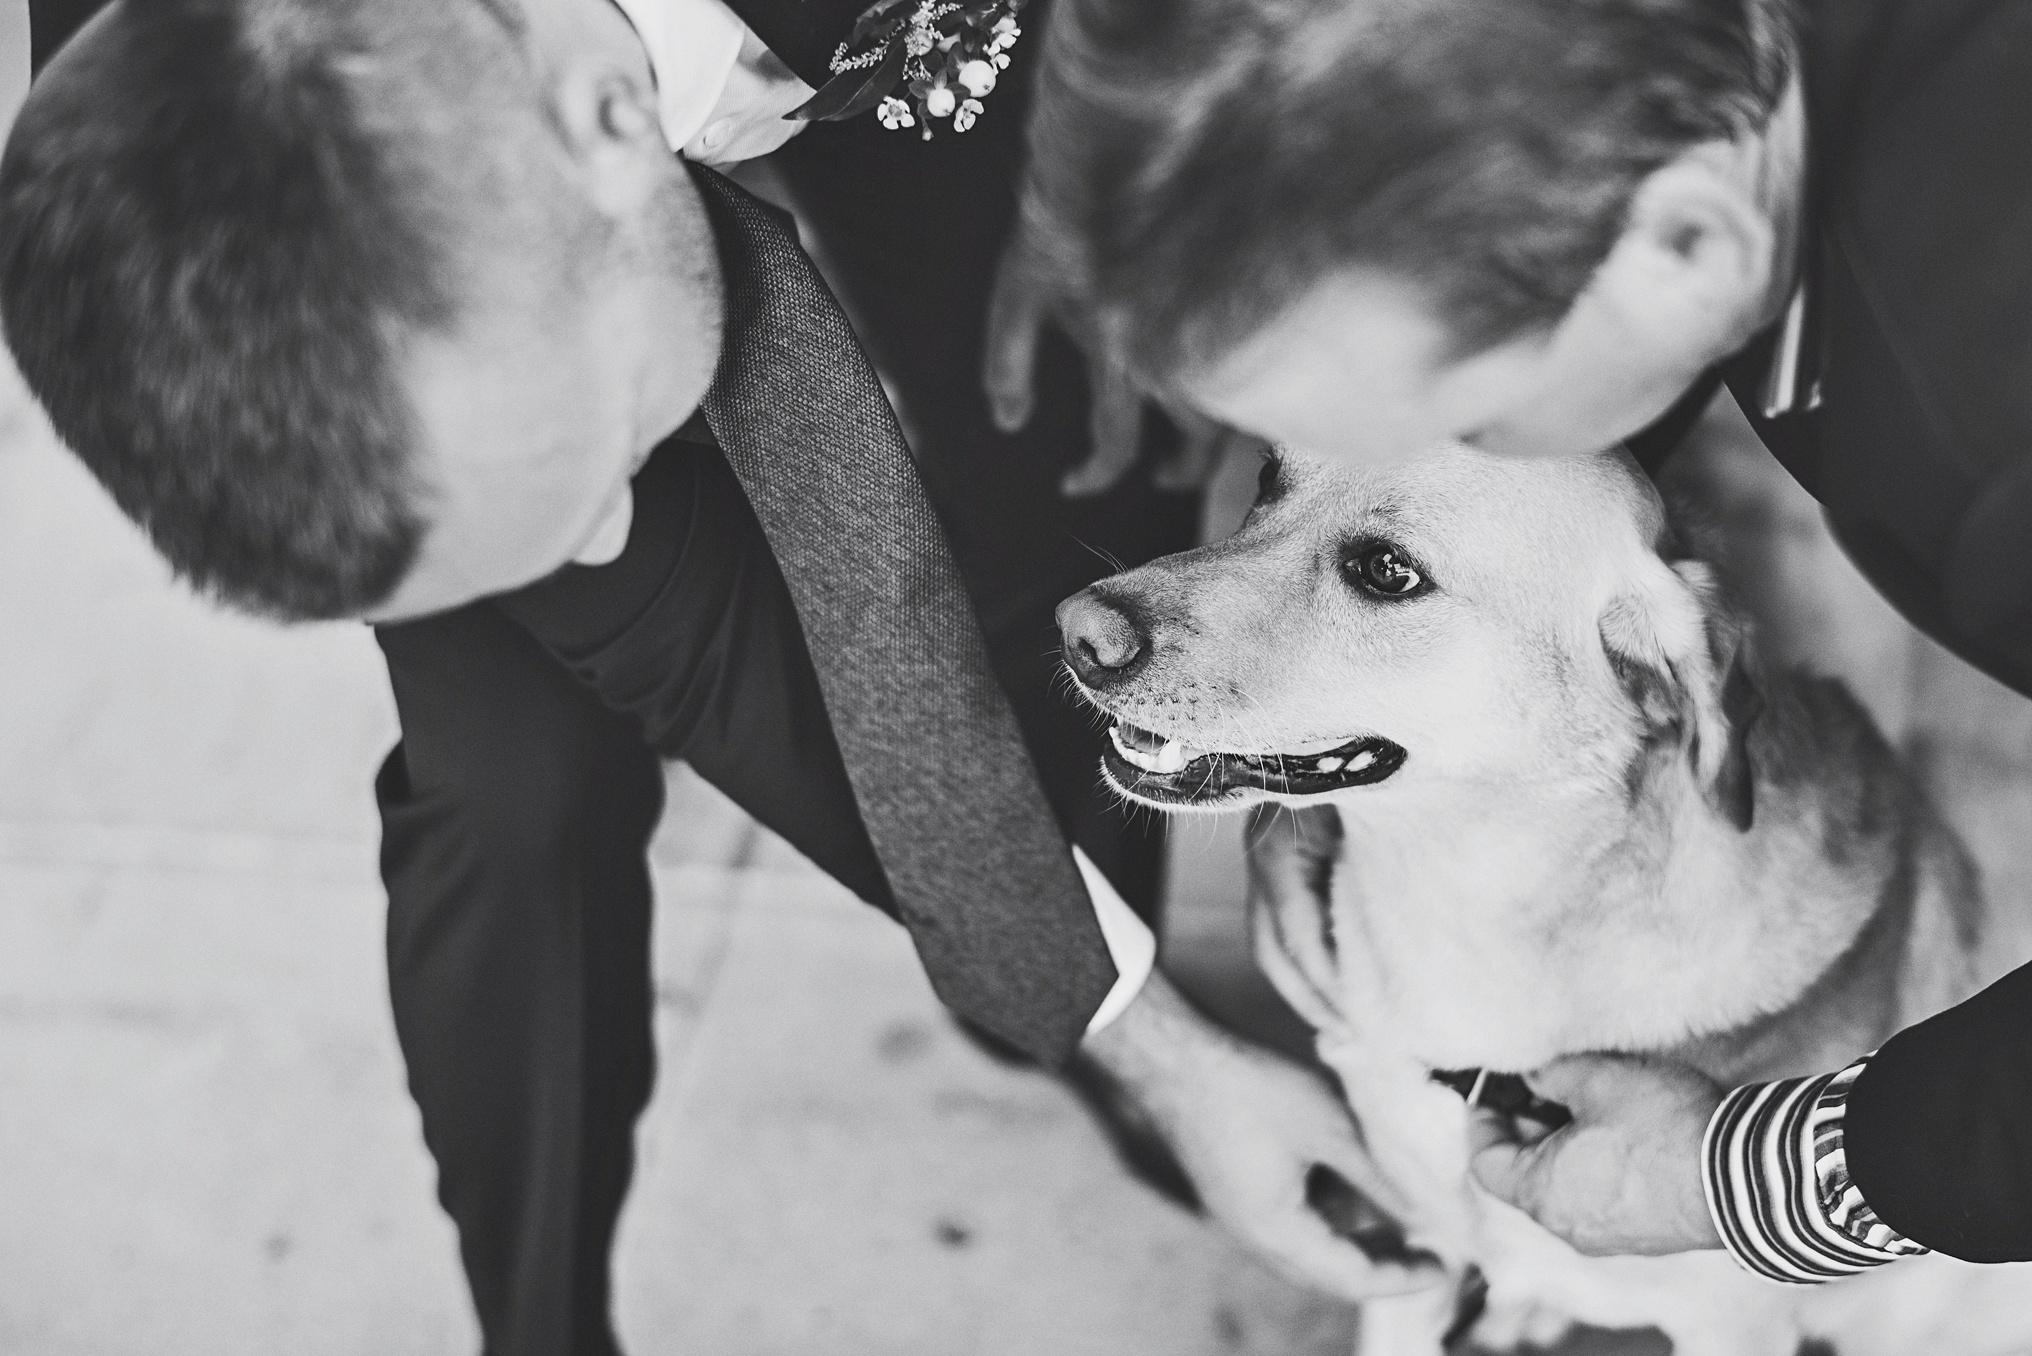 best_wedding_photography_2017_by_lucas_botz_photography_066.jpg